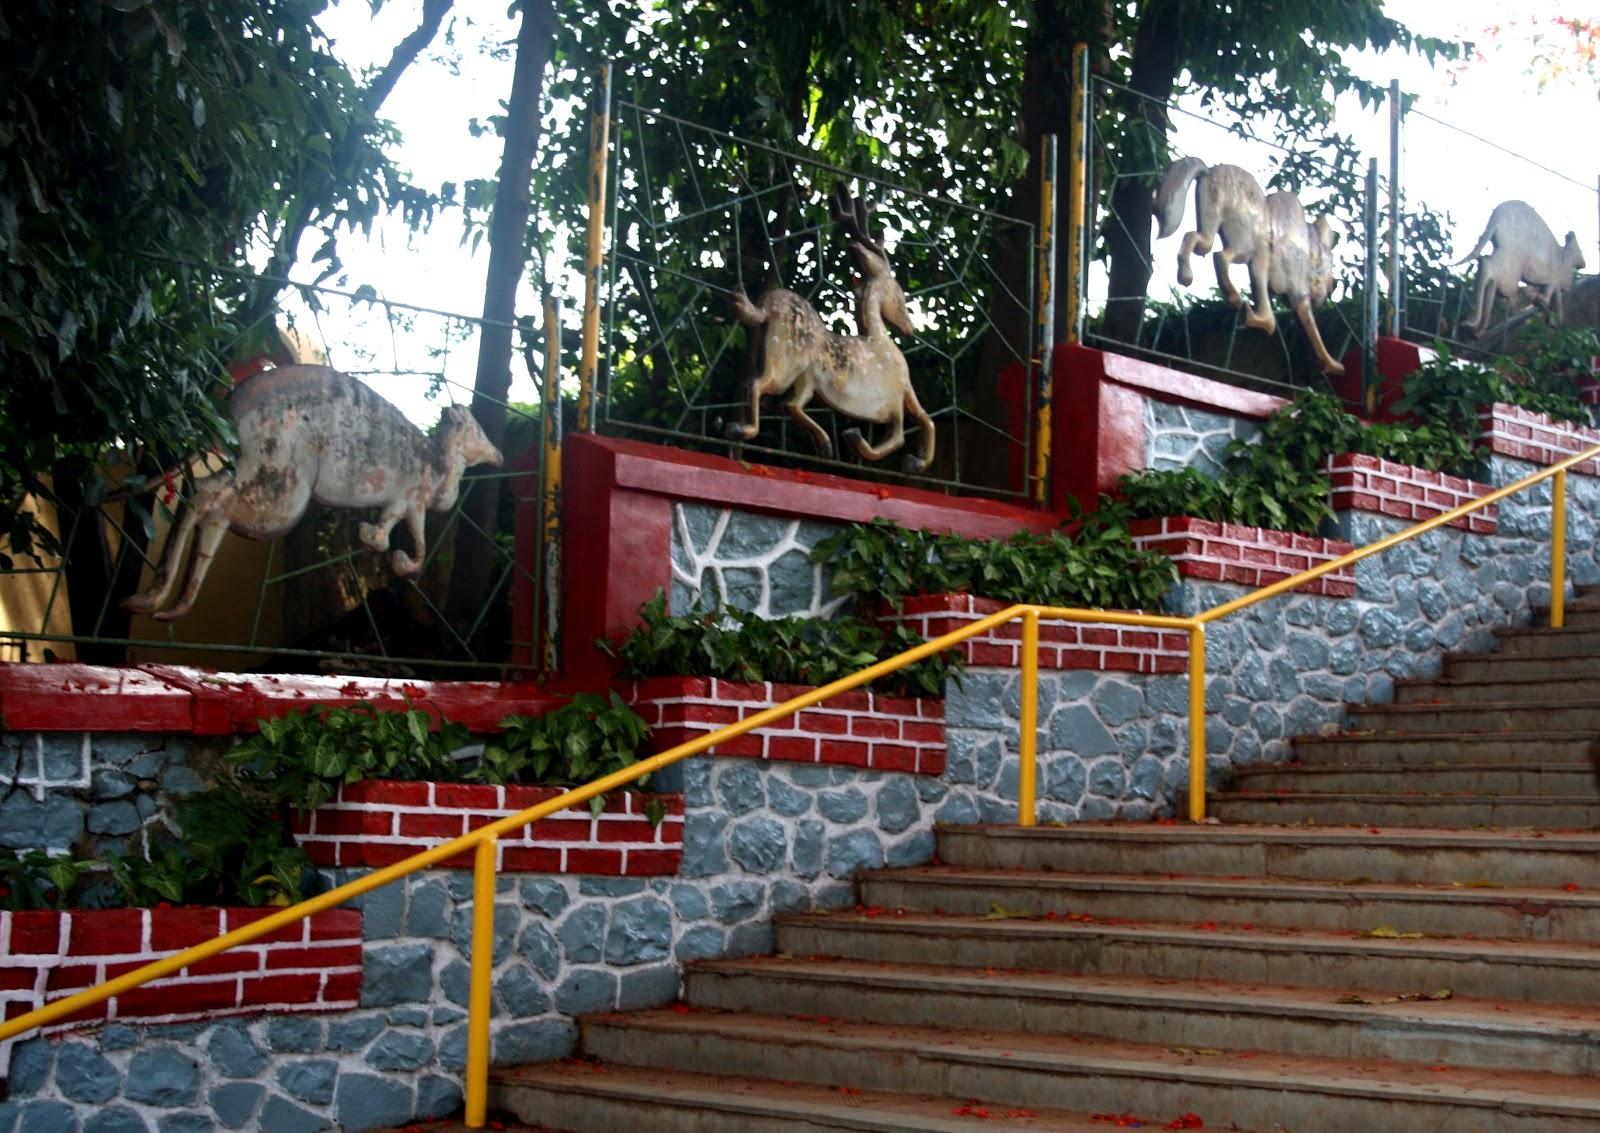 Mumbai City Tour Bus